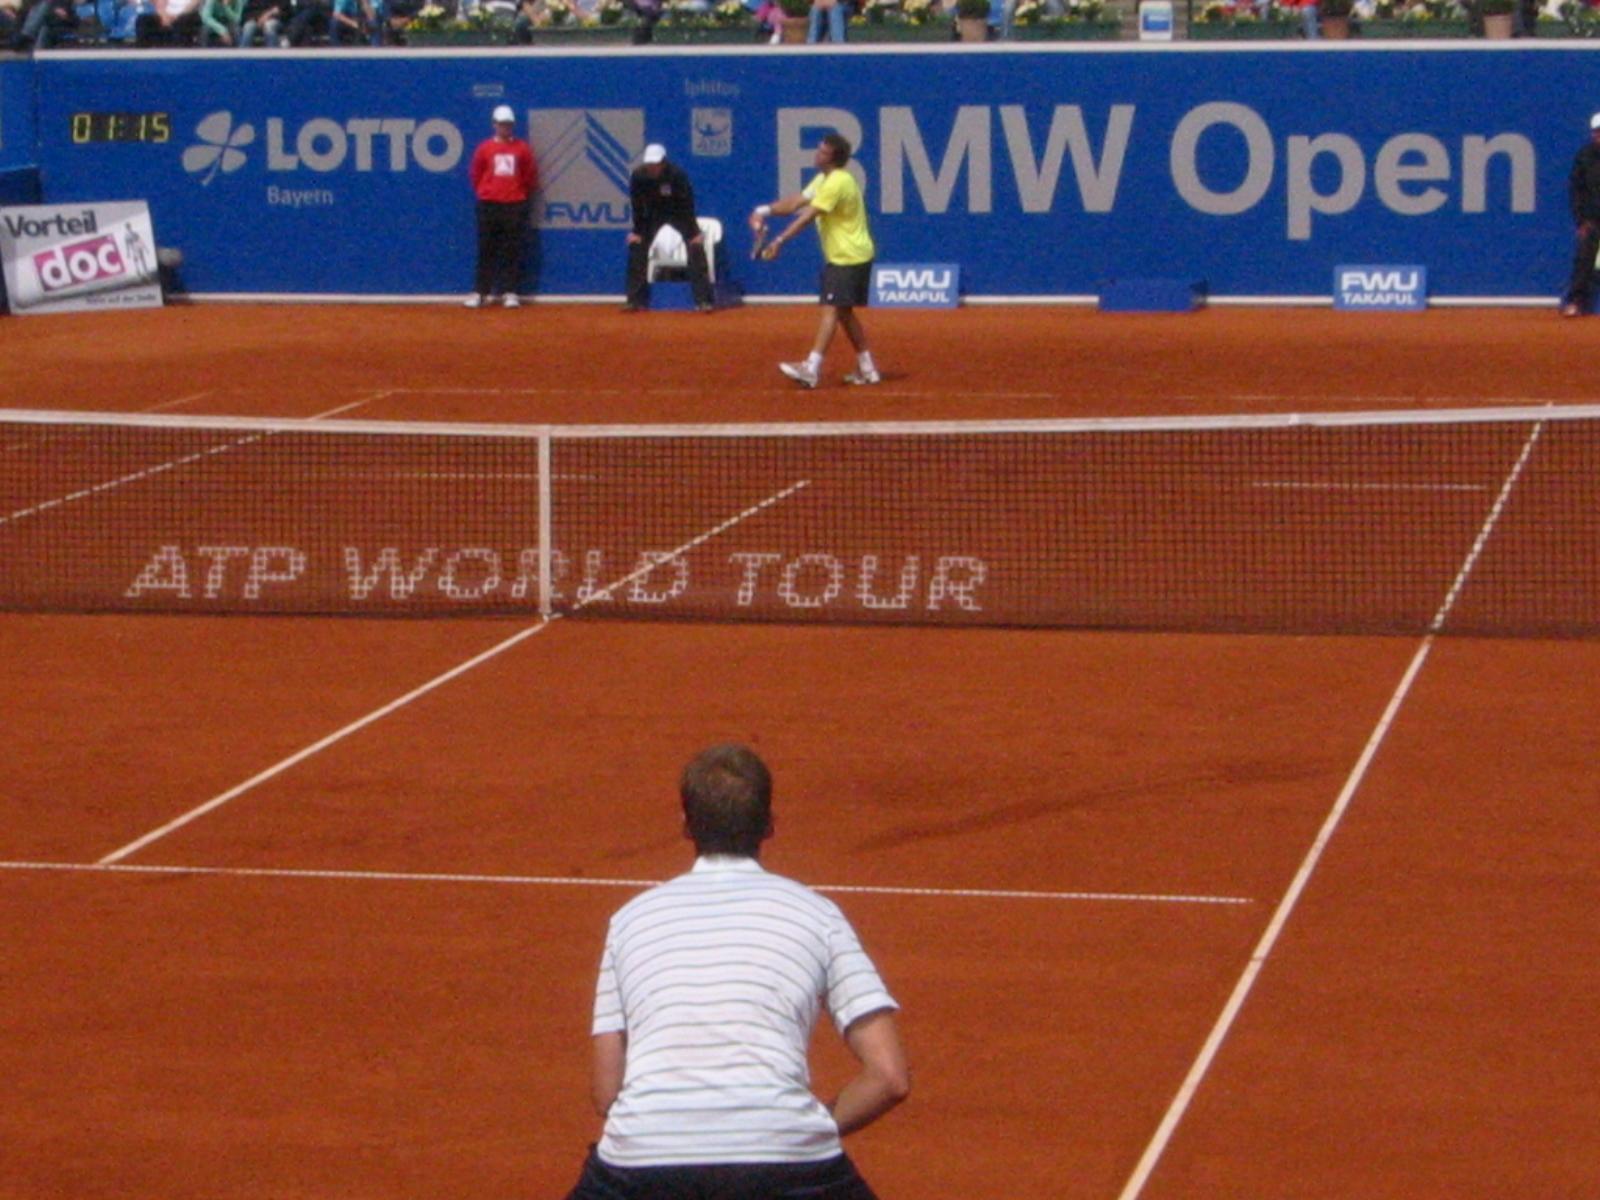 bmw open tennis